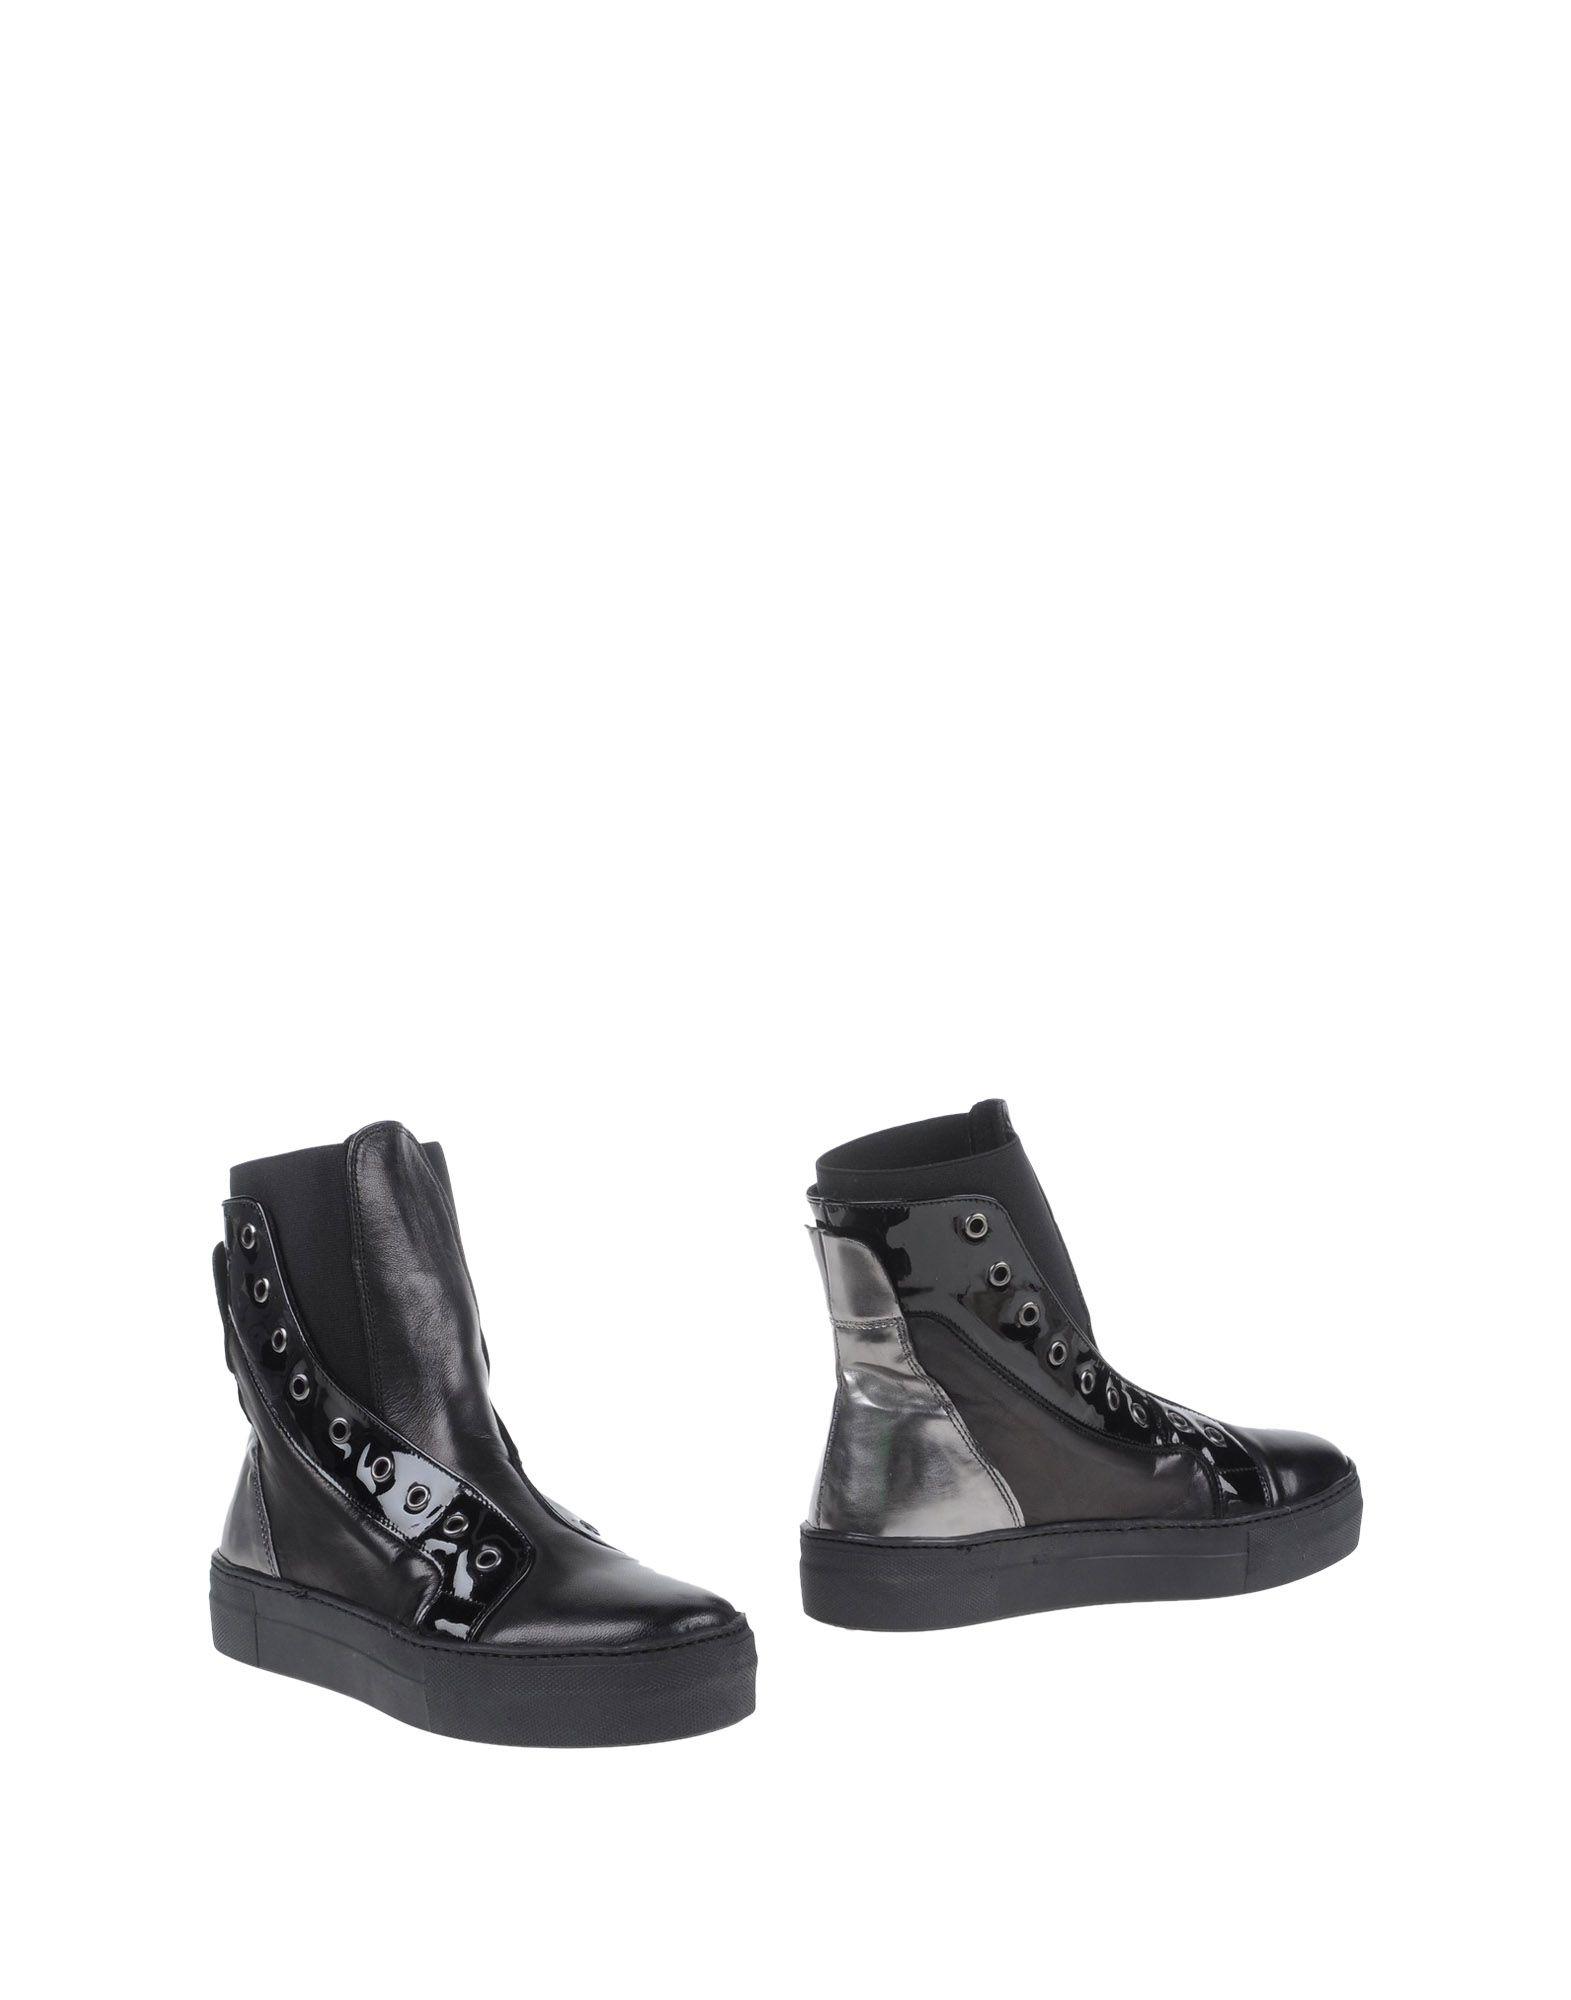 Lea Foscati Stiefelette  Damen  Stiefelette 11043046QU Gute Qualität beliebte Schuhe a11e71